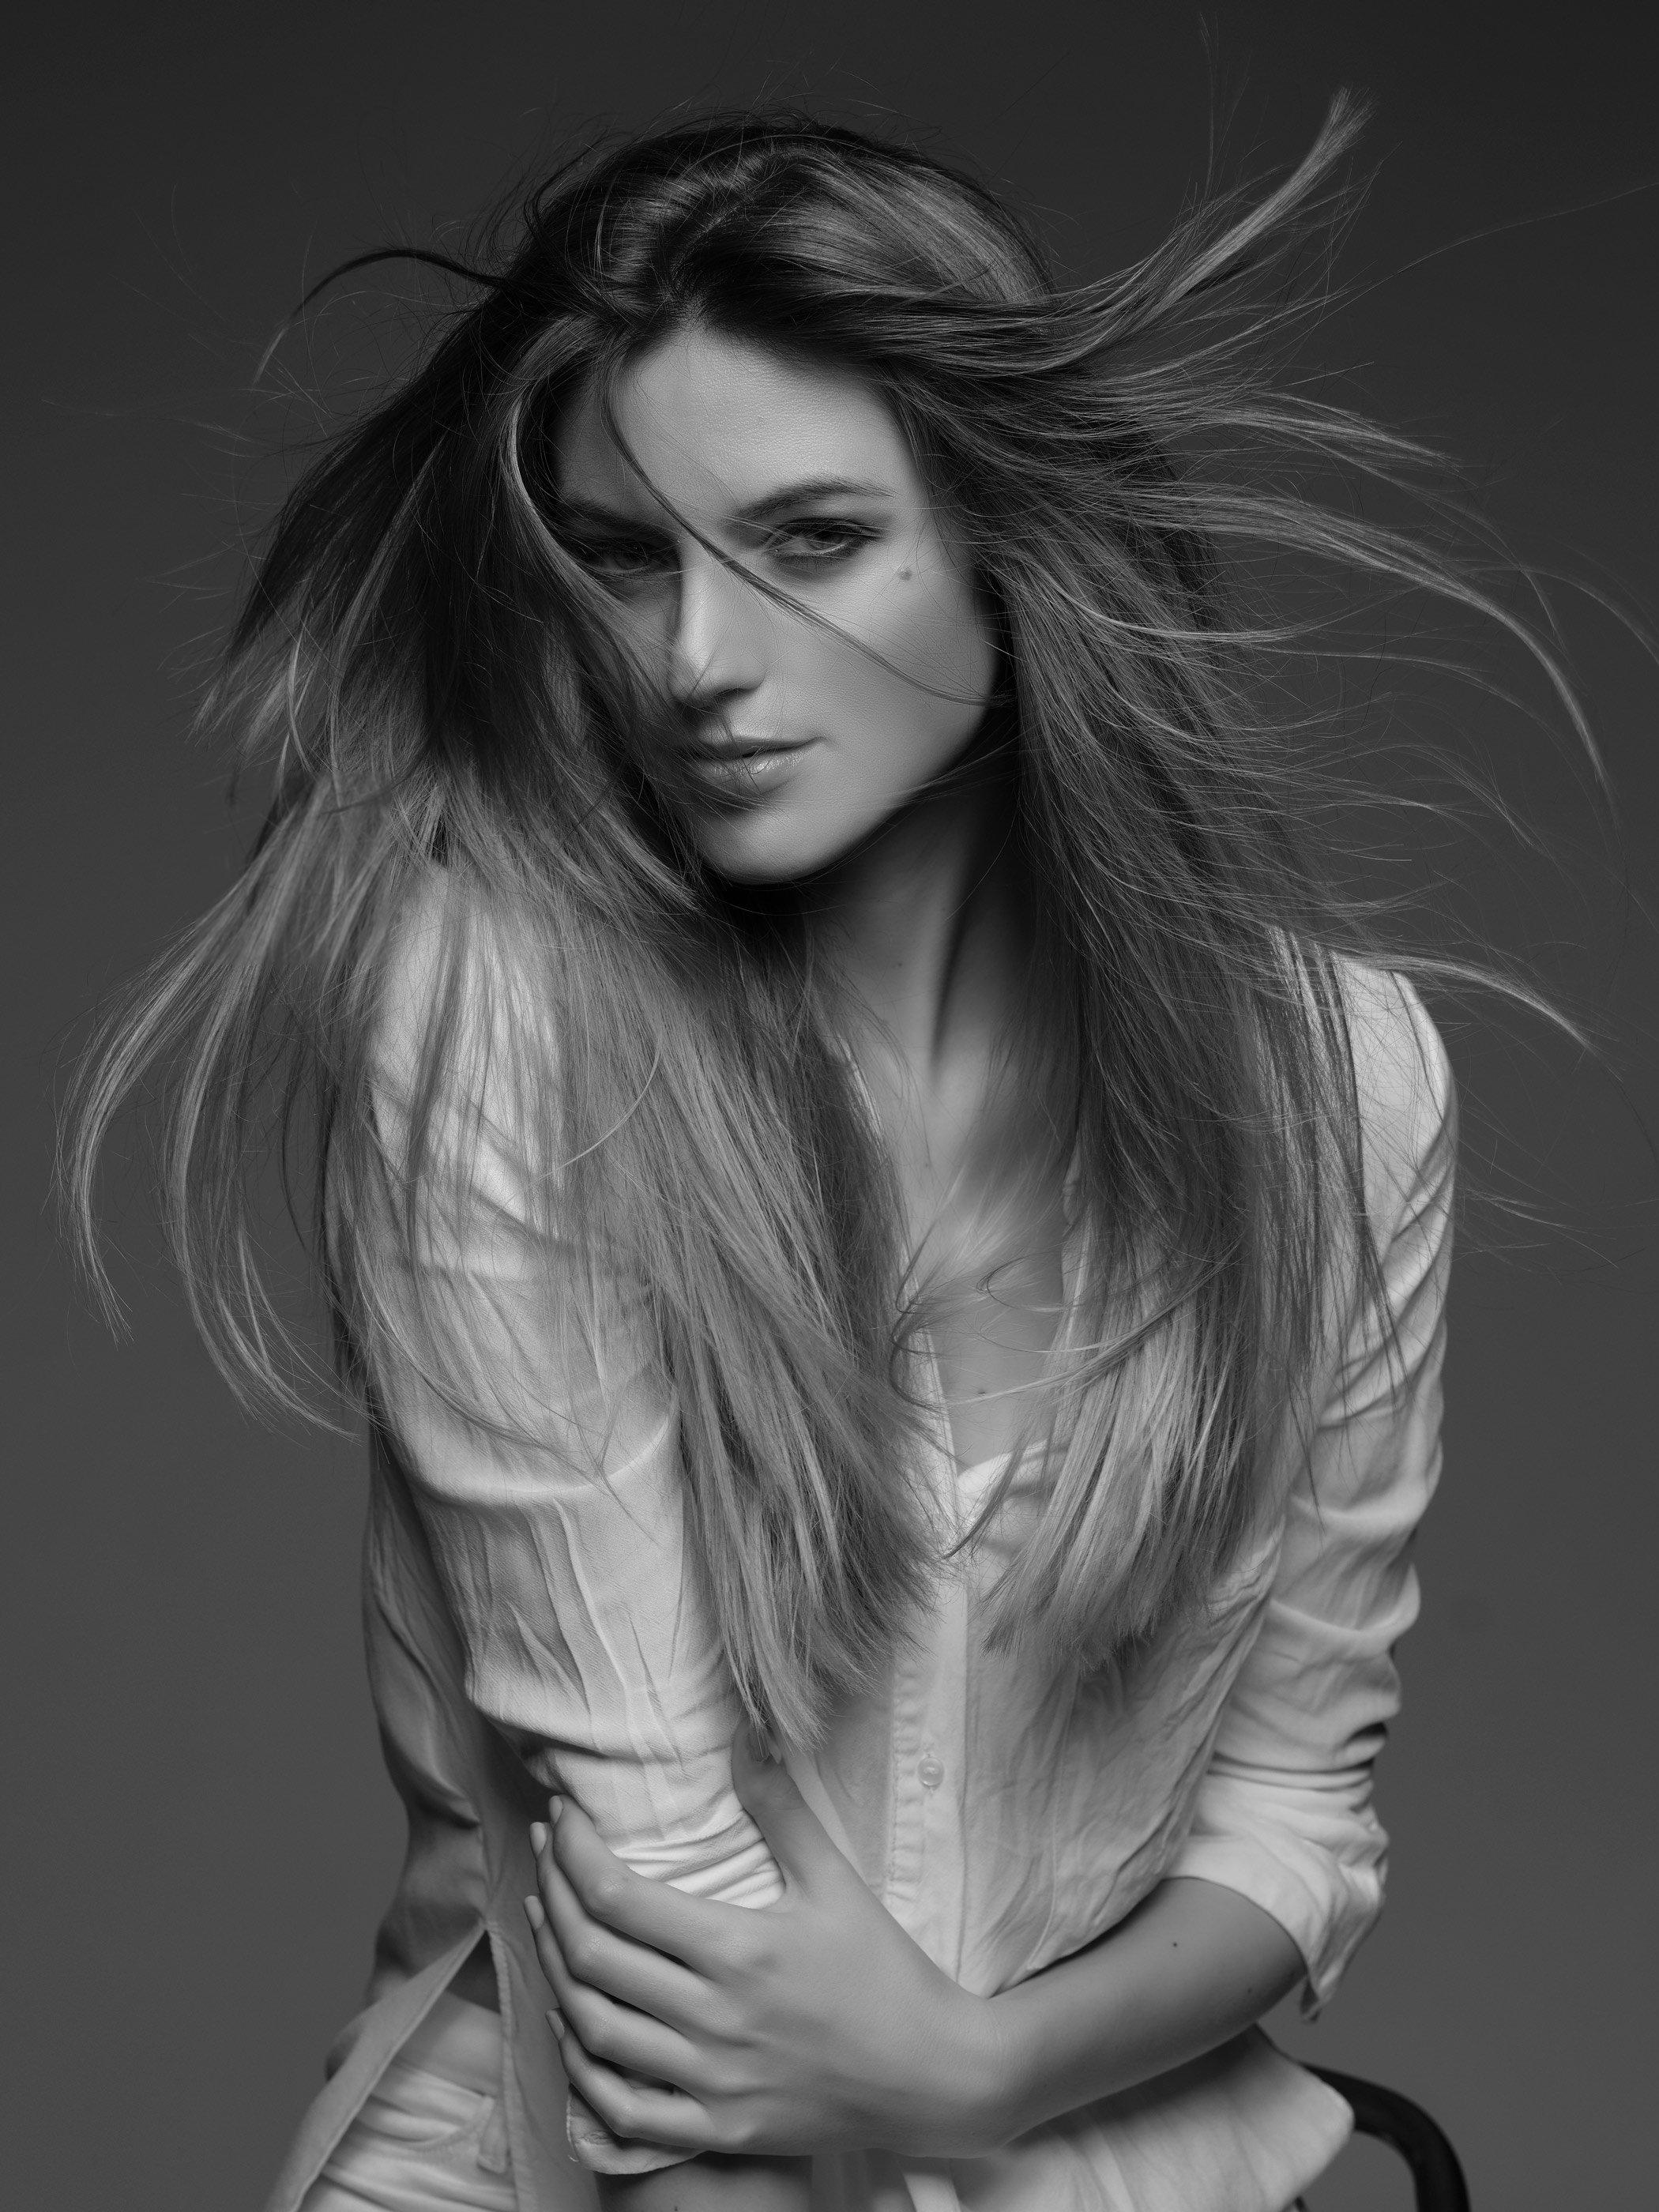 Gorgeous Hungarian Model - Lilla Primmer by em. - em